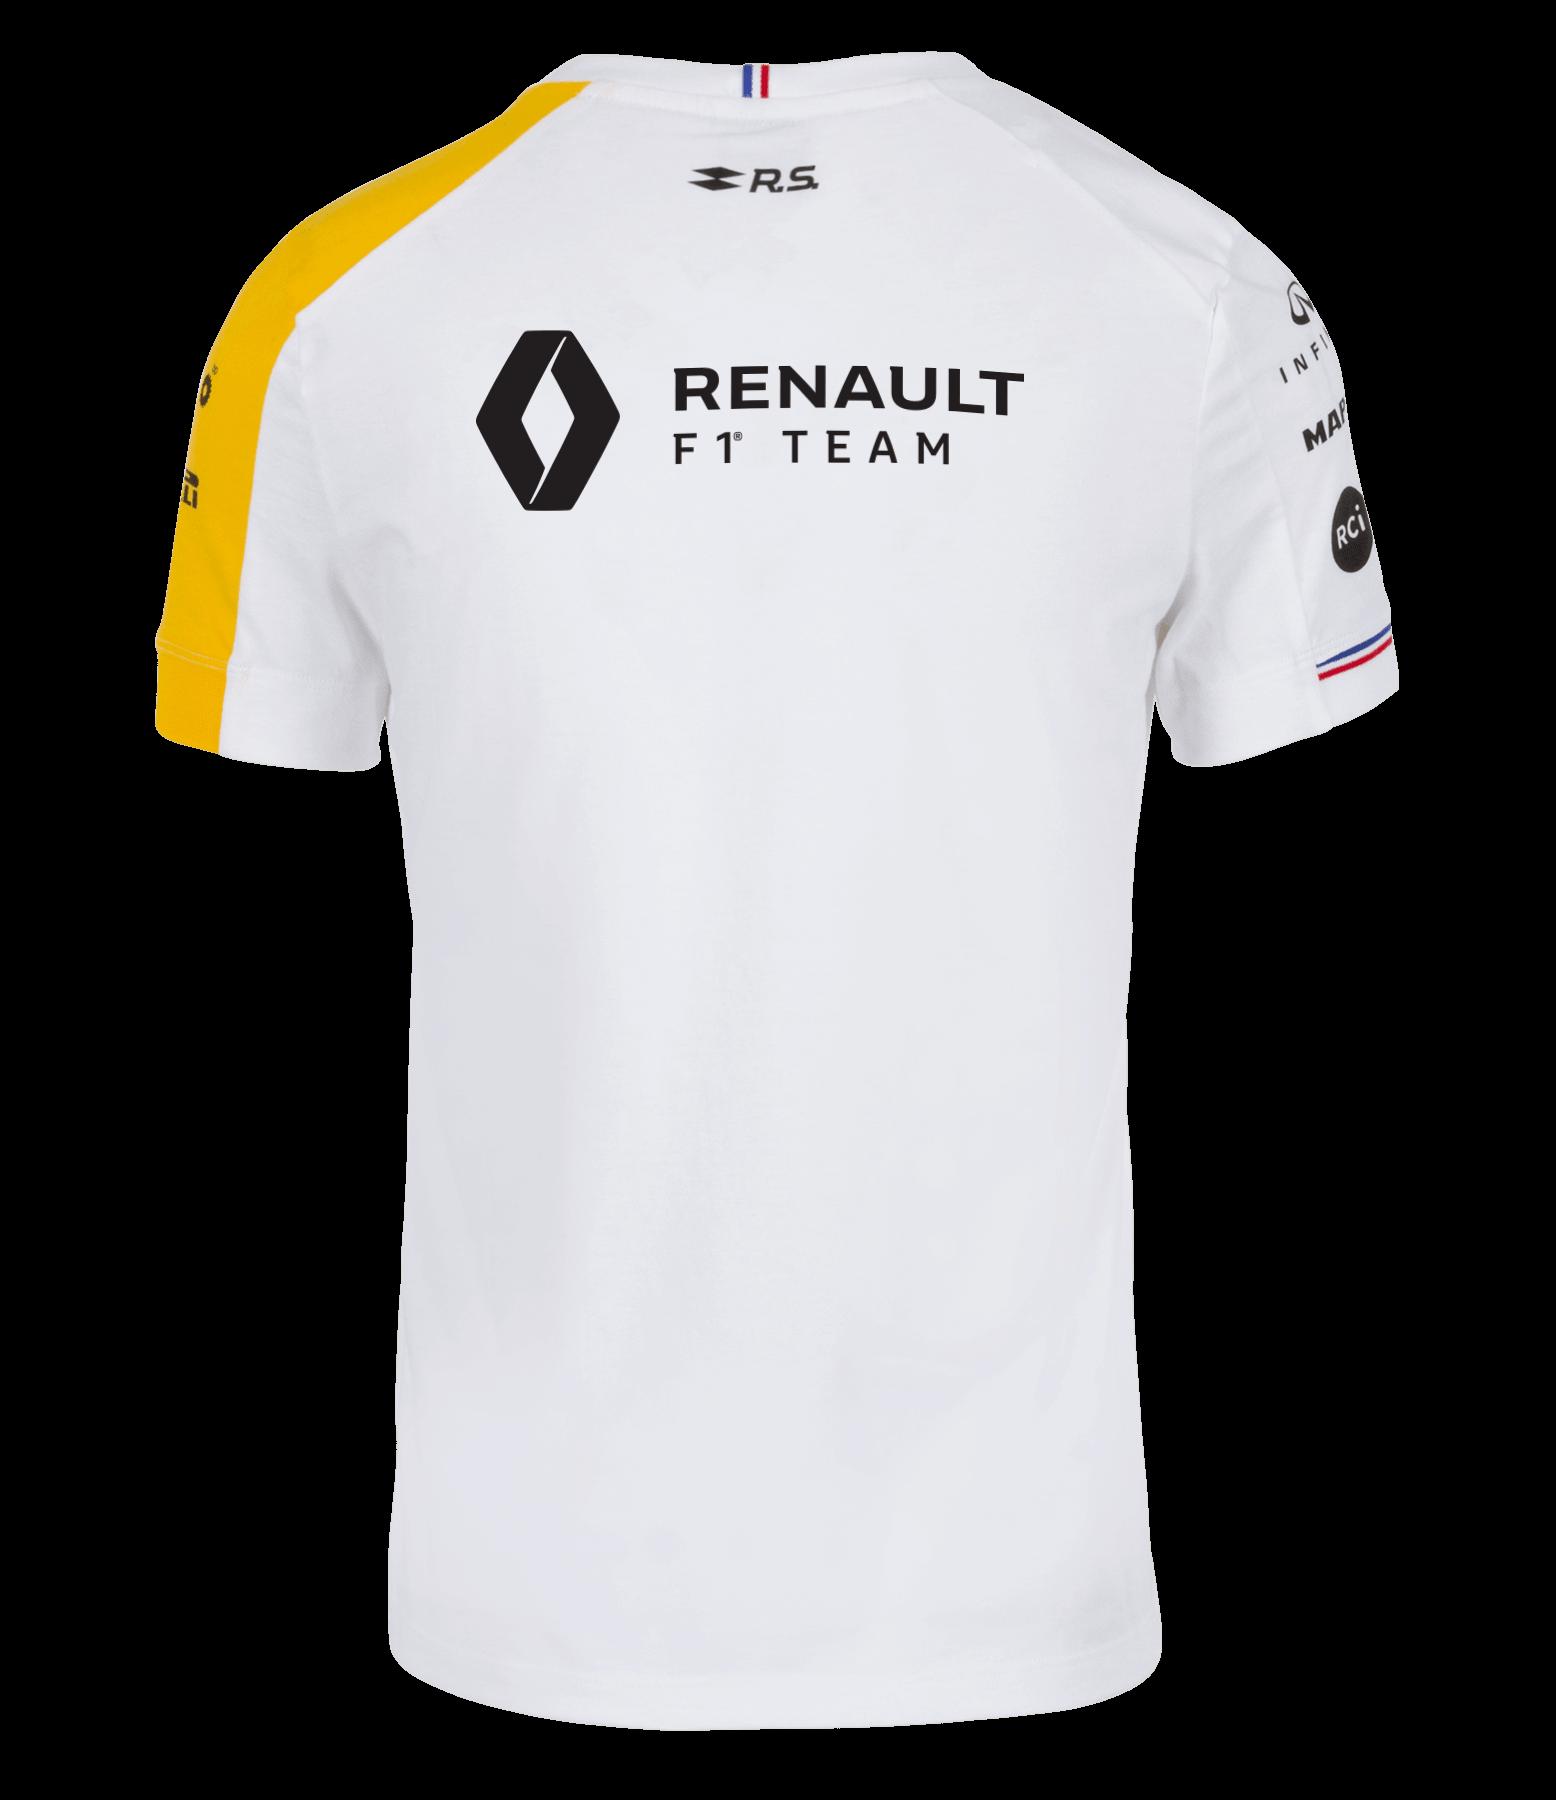 Camiseta RENAULT F1® TEAM 2019 blanca para hombre.